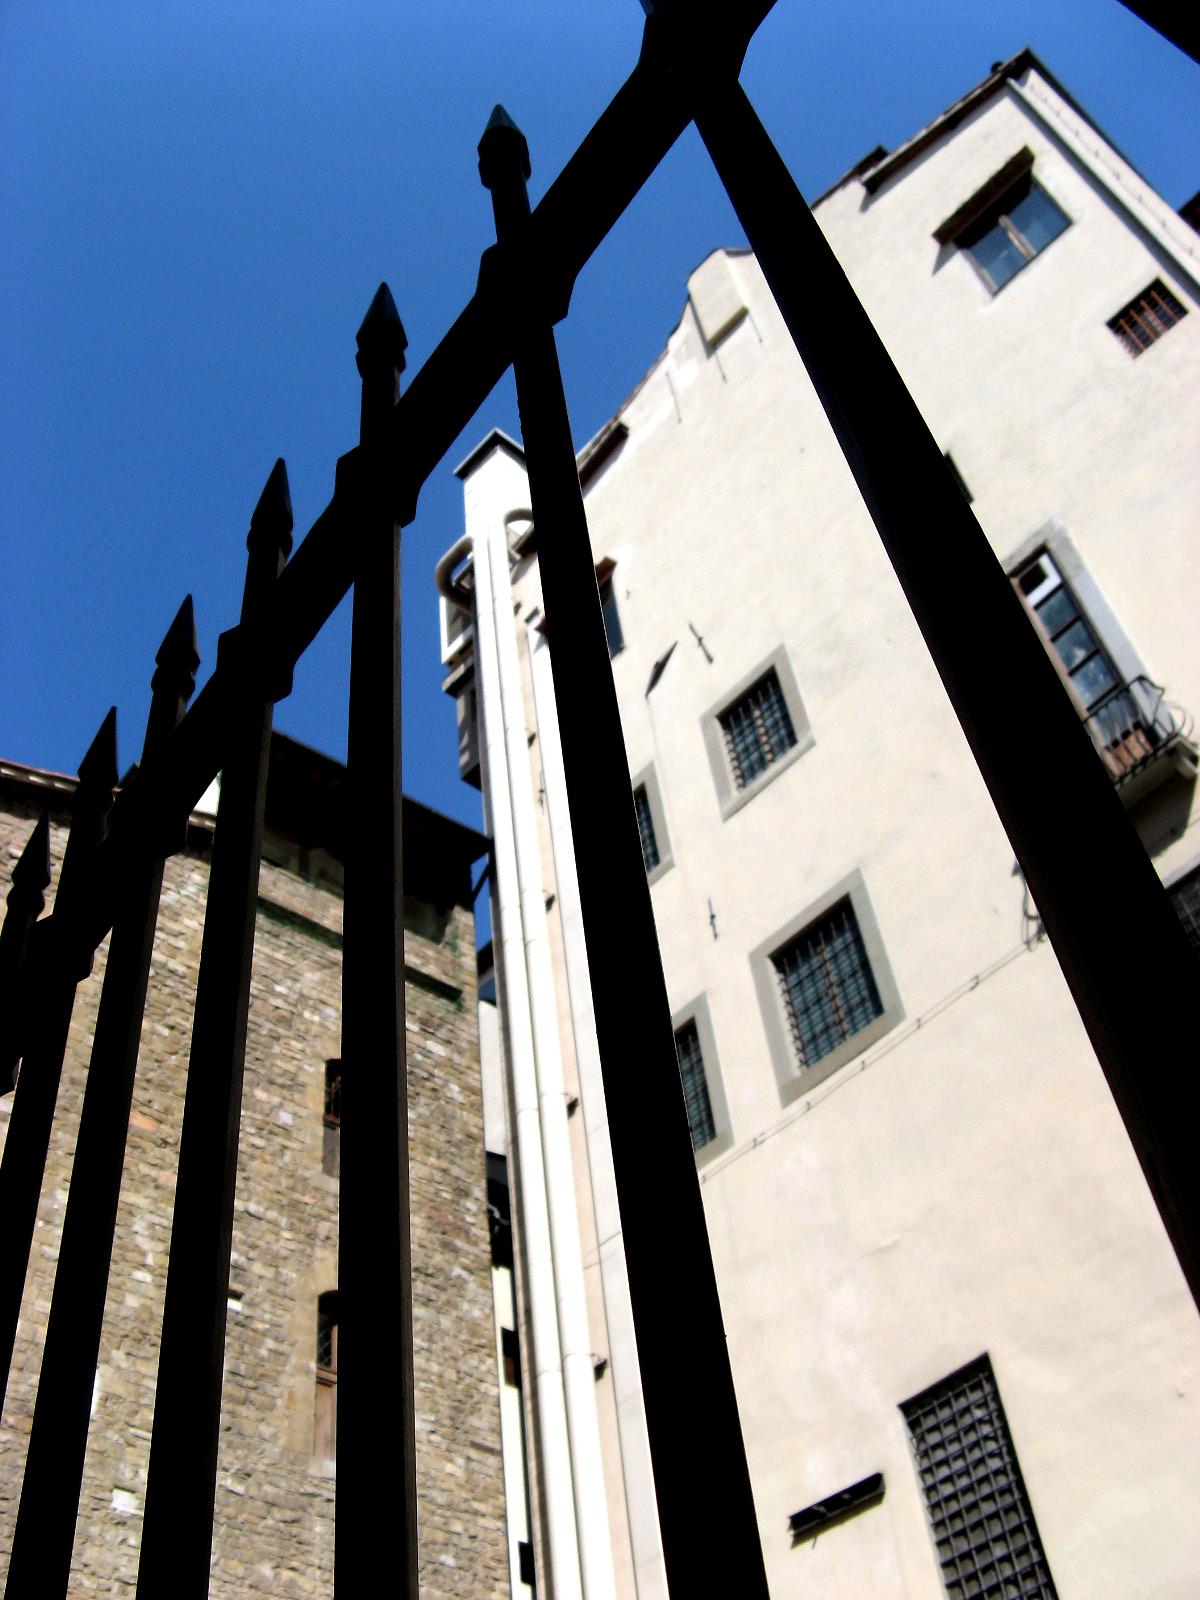 Fancy fence, Bspo06, Building, Contrast, Fence, HQ Photo